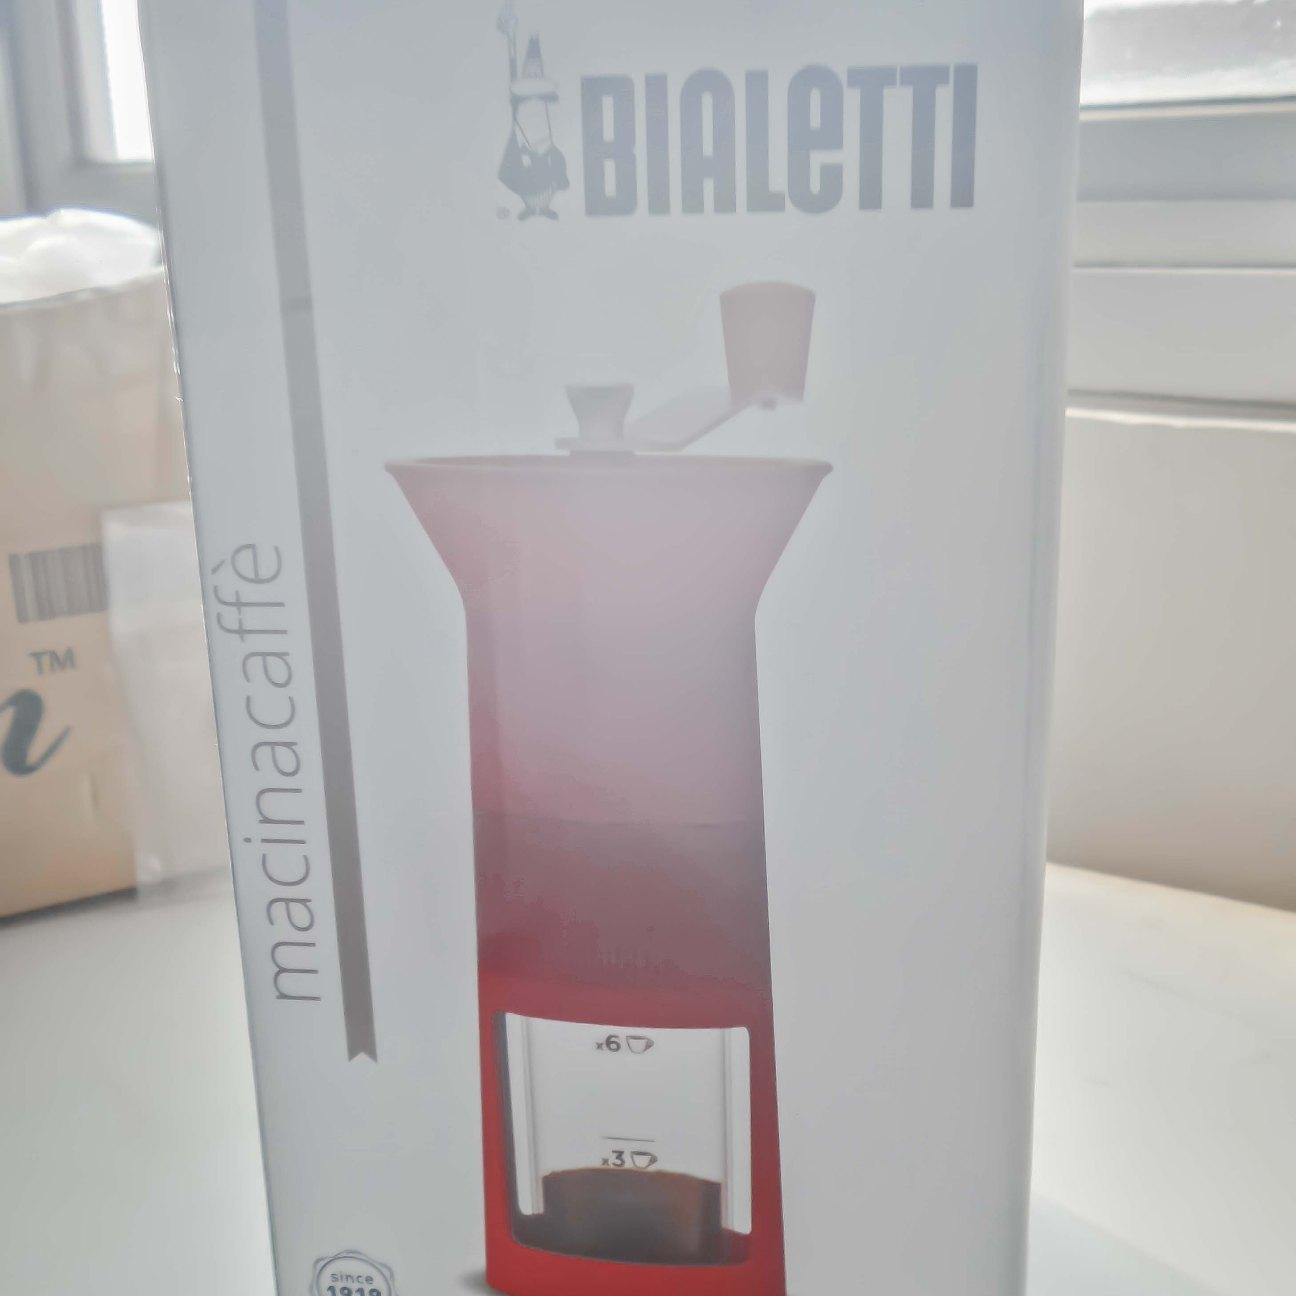 Unboxing Bialetti Macinacaffe.